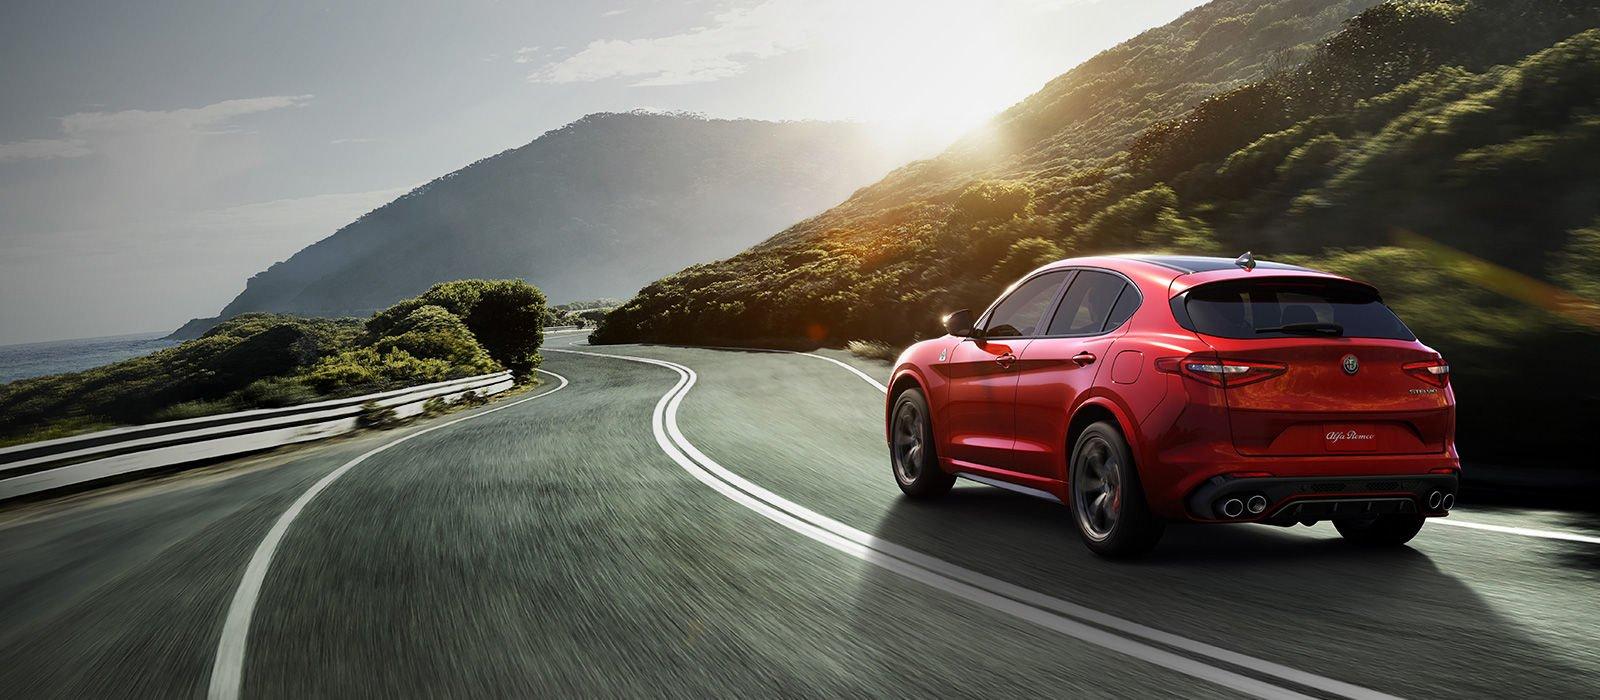 Alfa Romeo Stelvio Lease Deals Finance Prices Danvers Ma